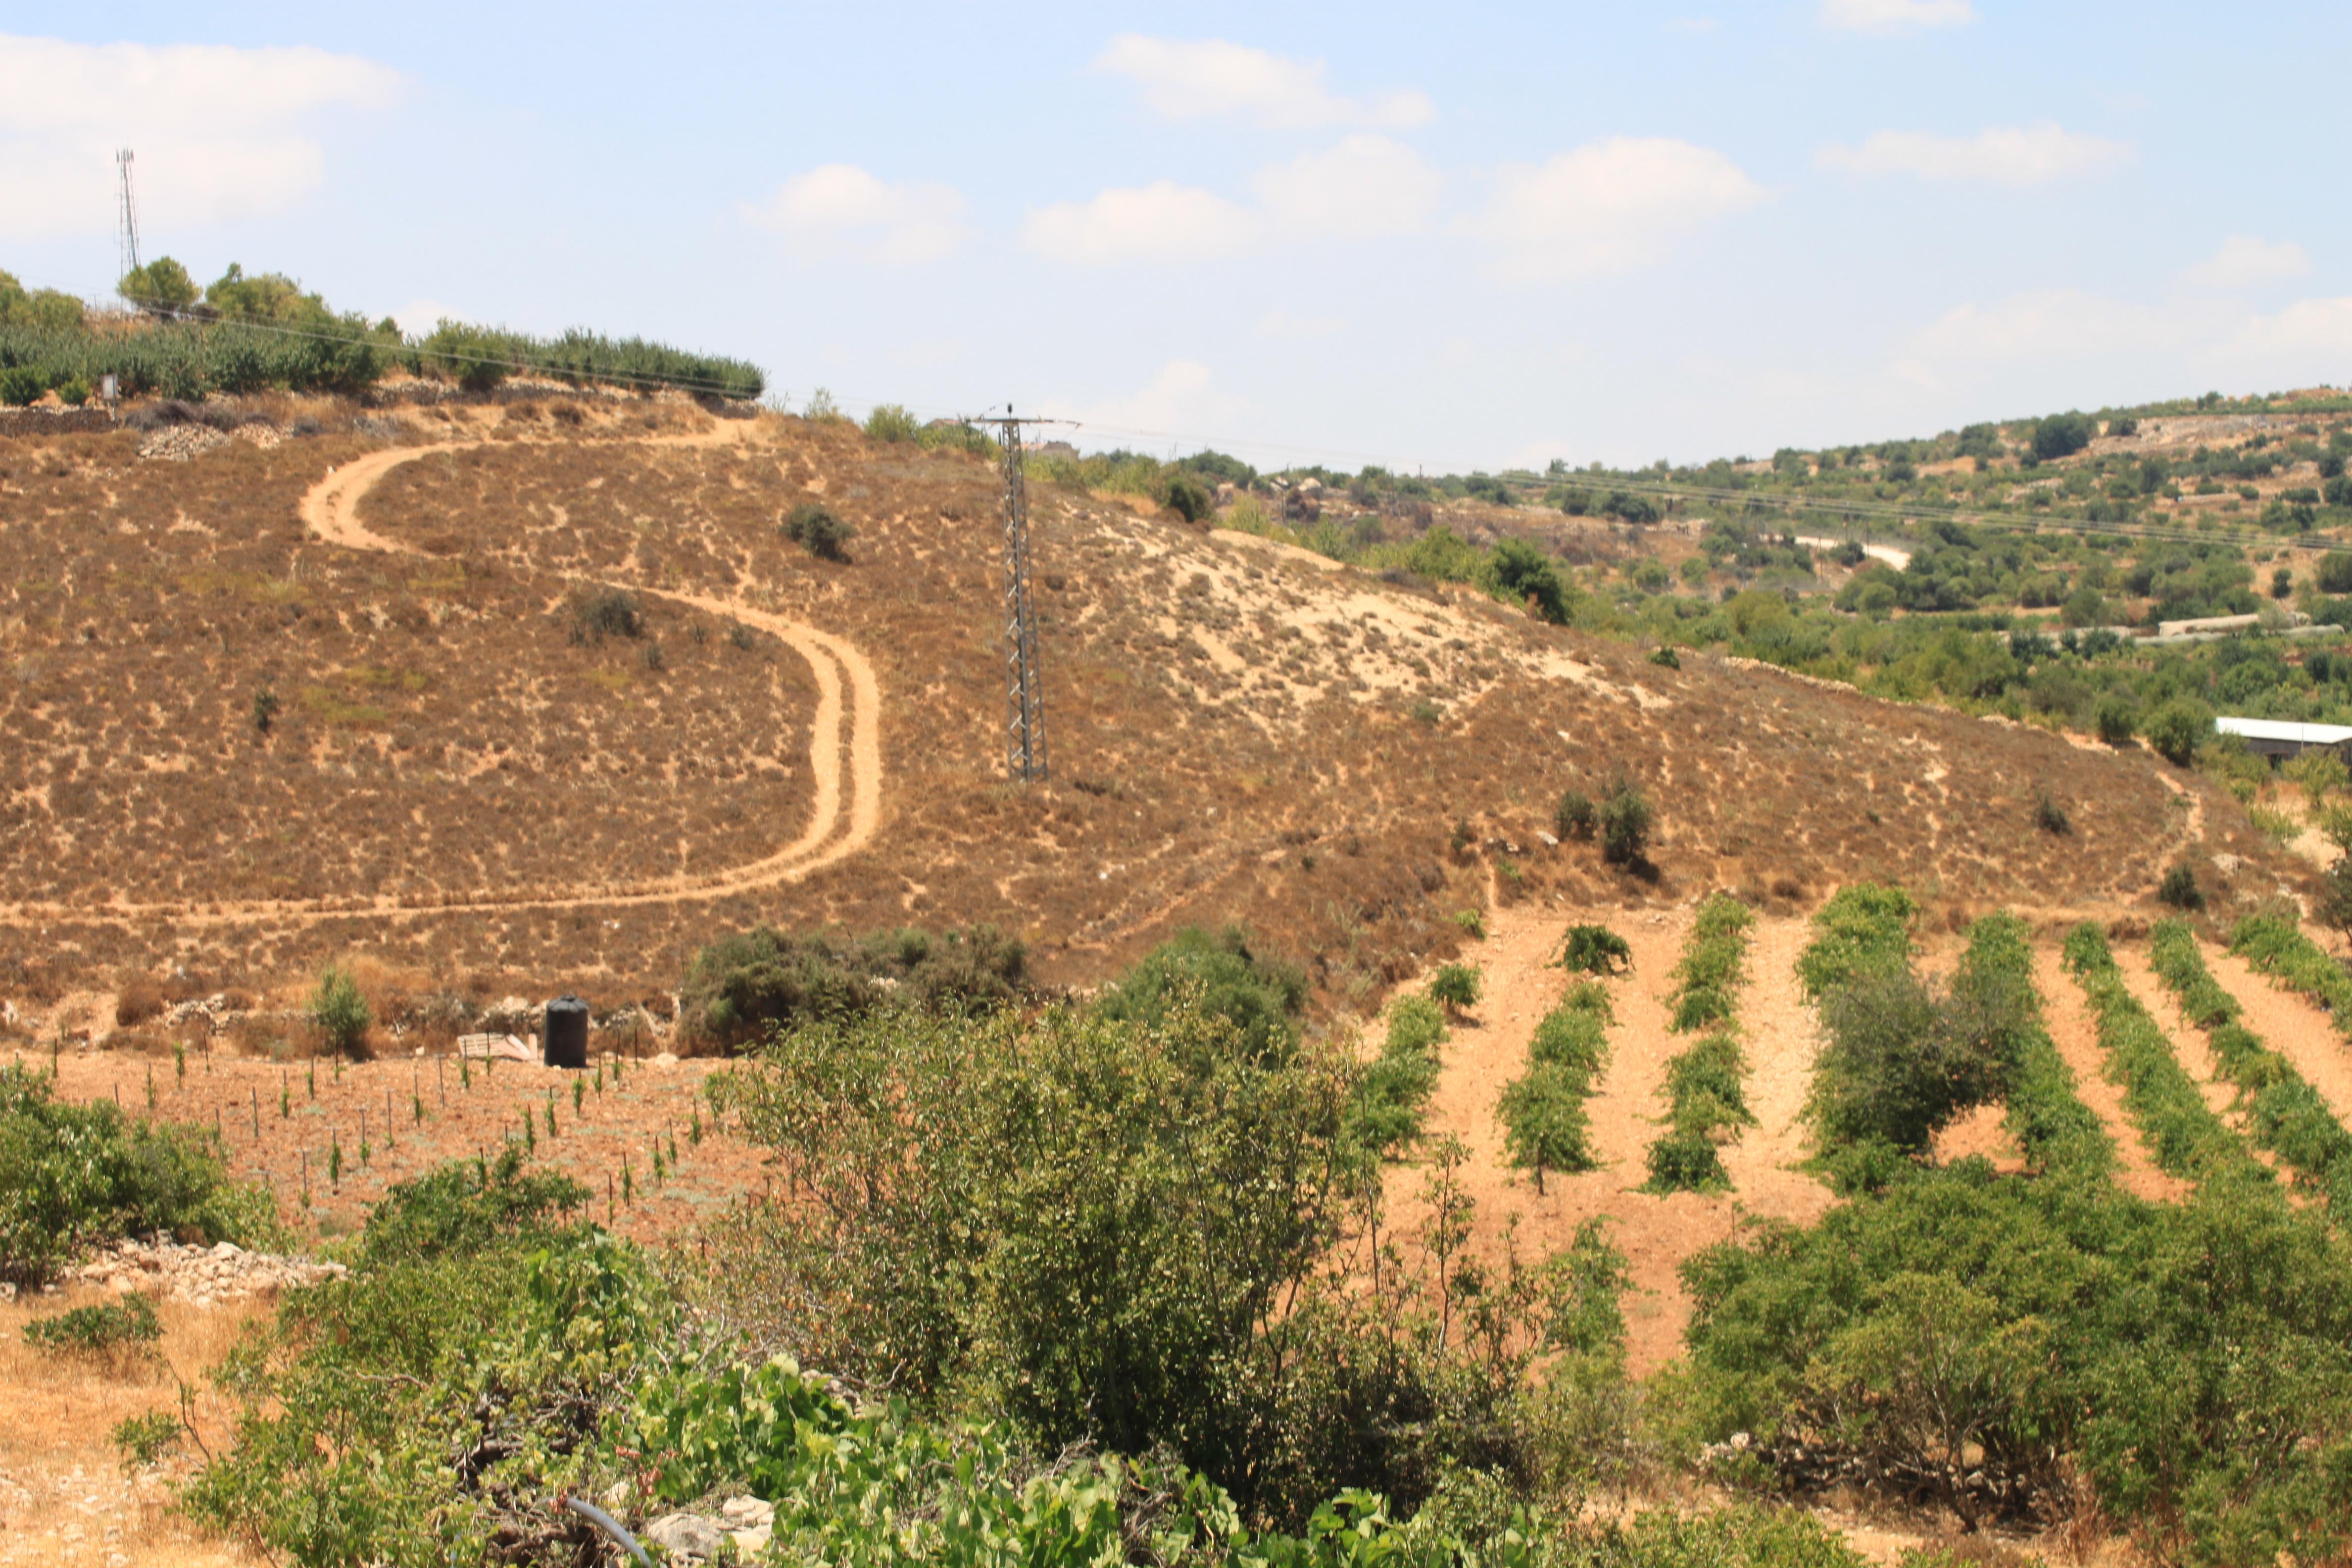 Al Shoroq: The activist farmers resisting Israeli annexation